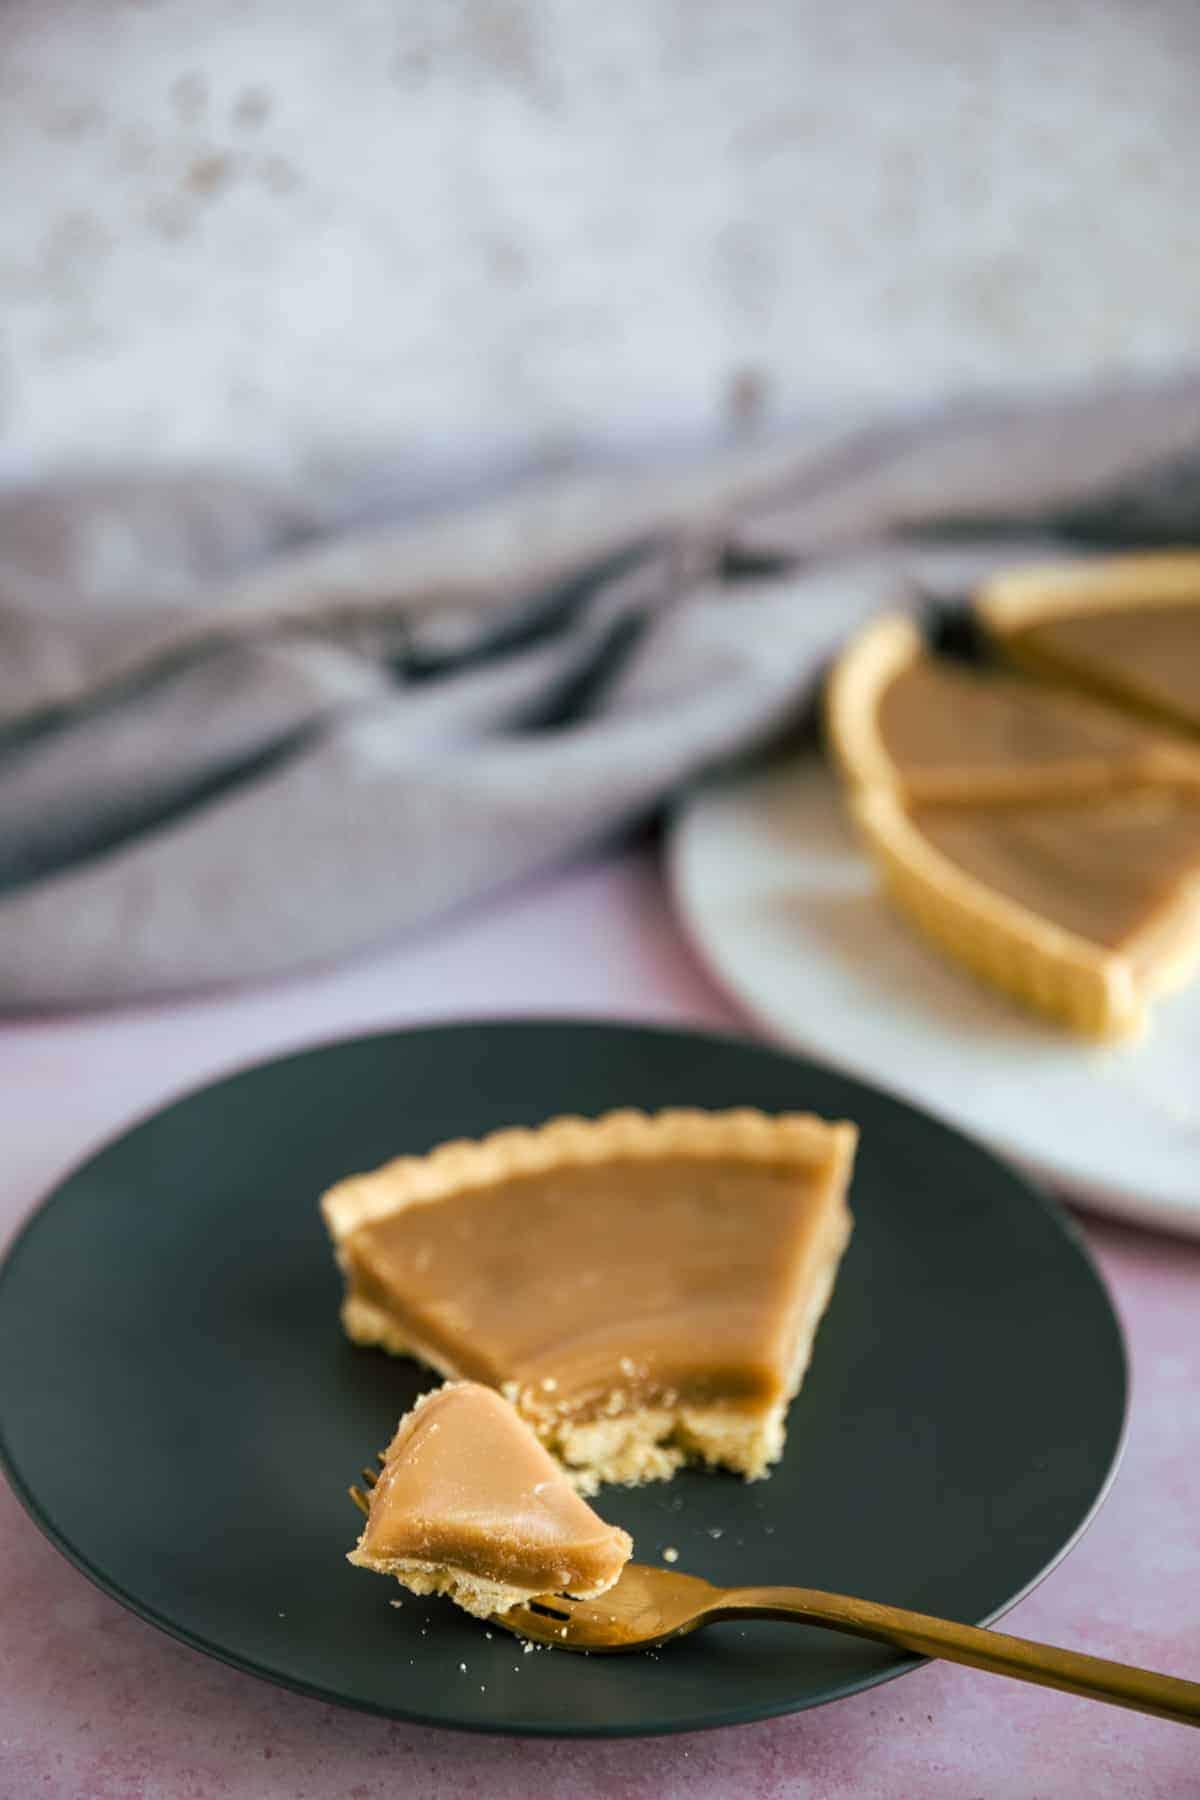 A shortcrust pastry tart with a caramel butterscotch filling.